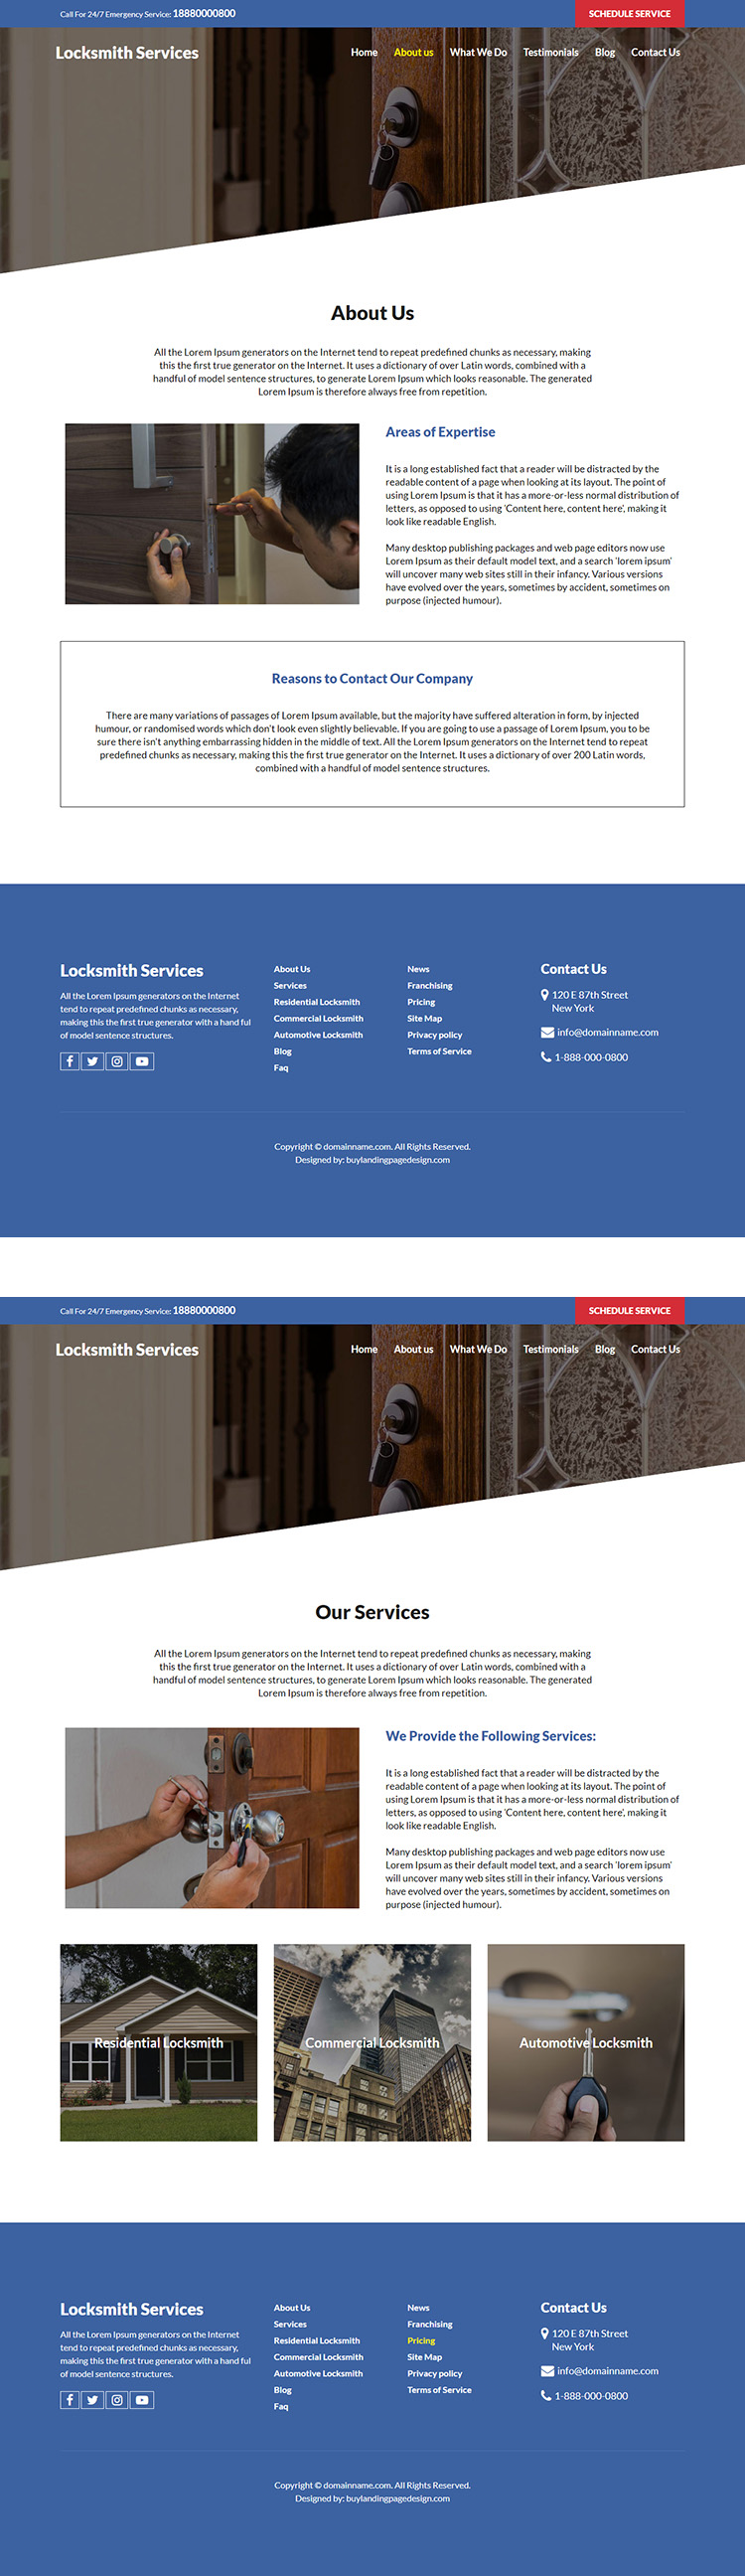 emergency locksmith service responsive website design